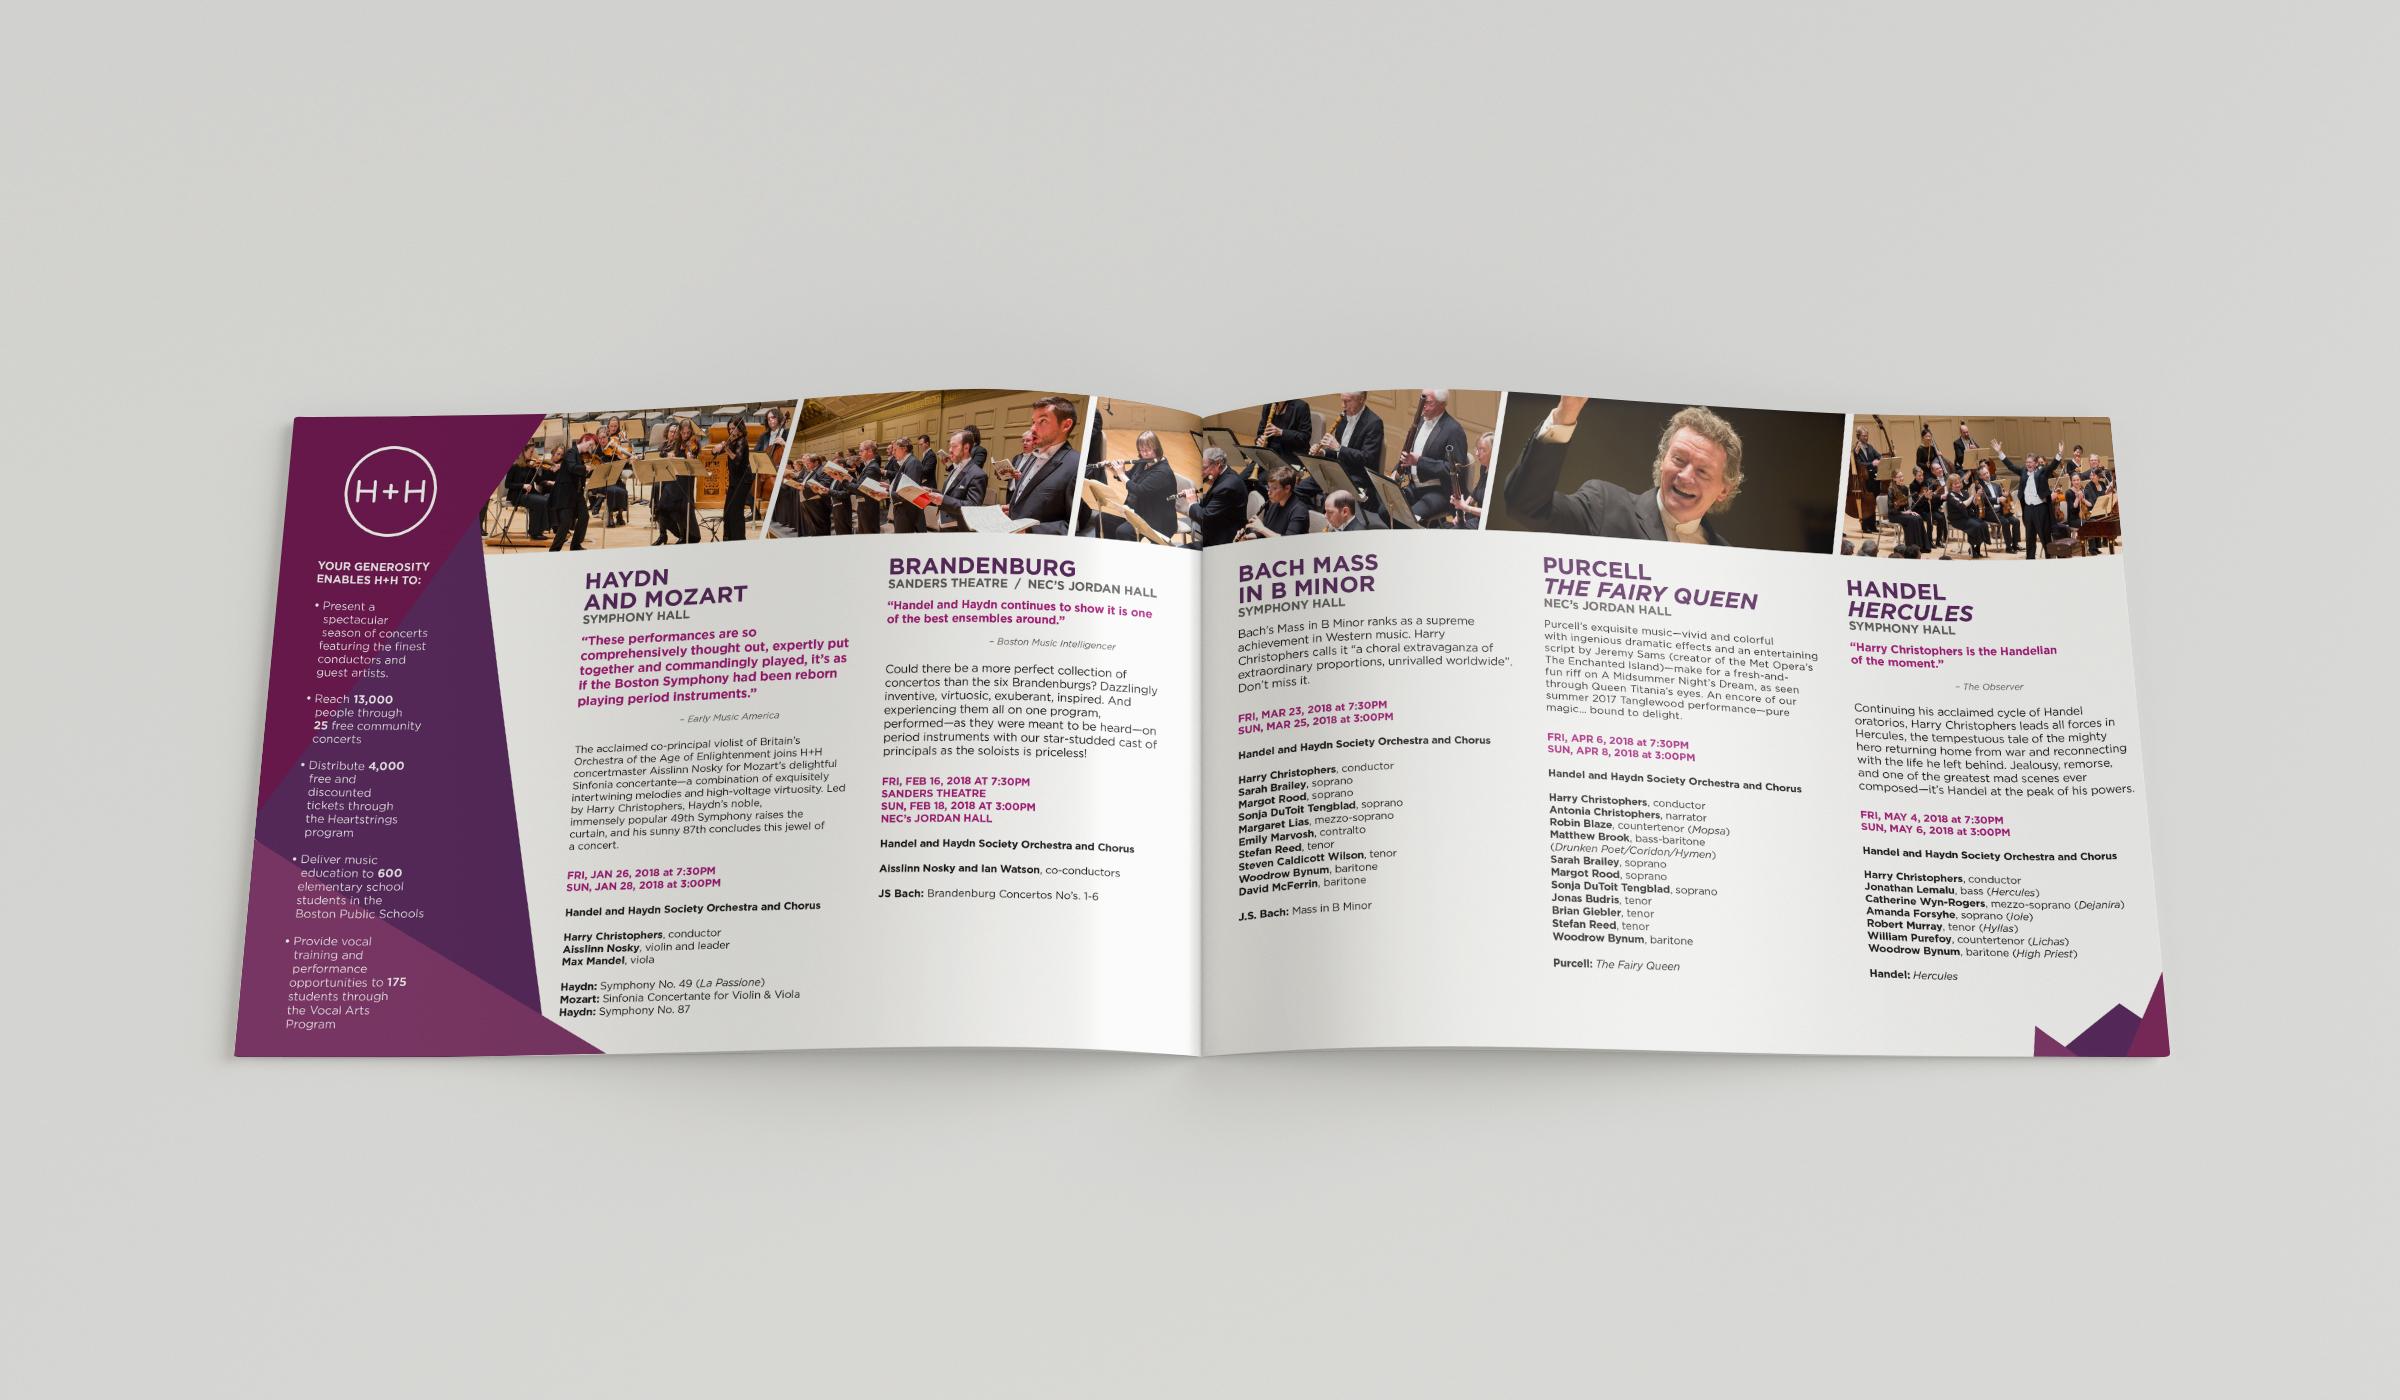 Handel and Haydn Society Brochure Mockup 5_WEB.jpg